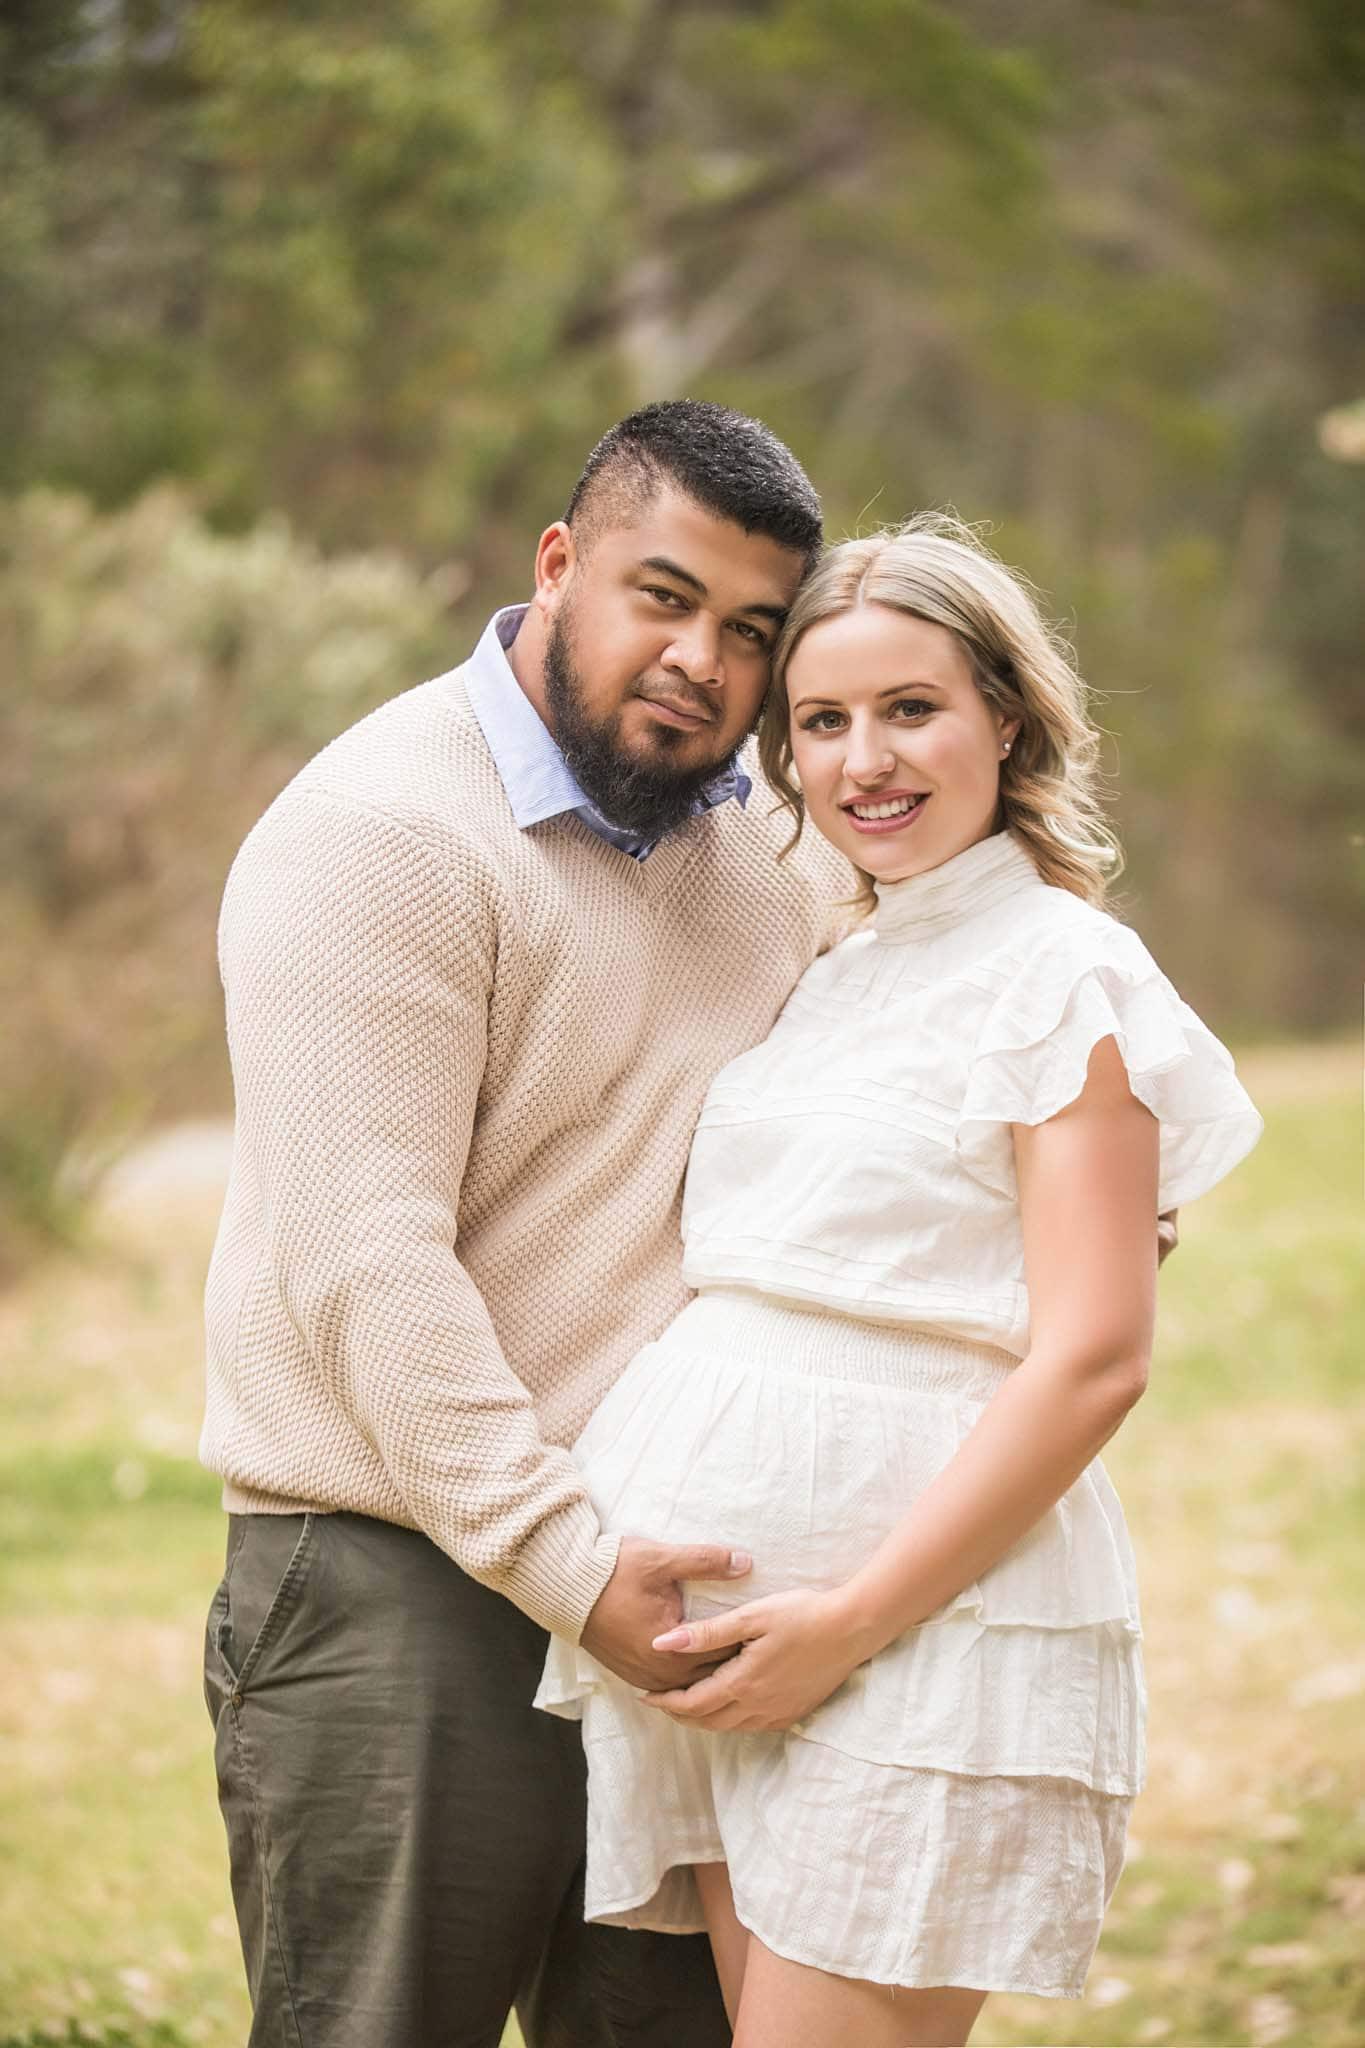 Maternity Photography Pregnancy Photography Sydney Ryde Blossom Brook Studio